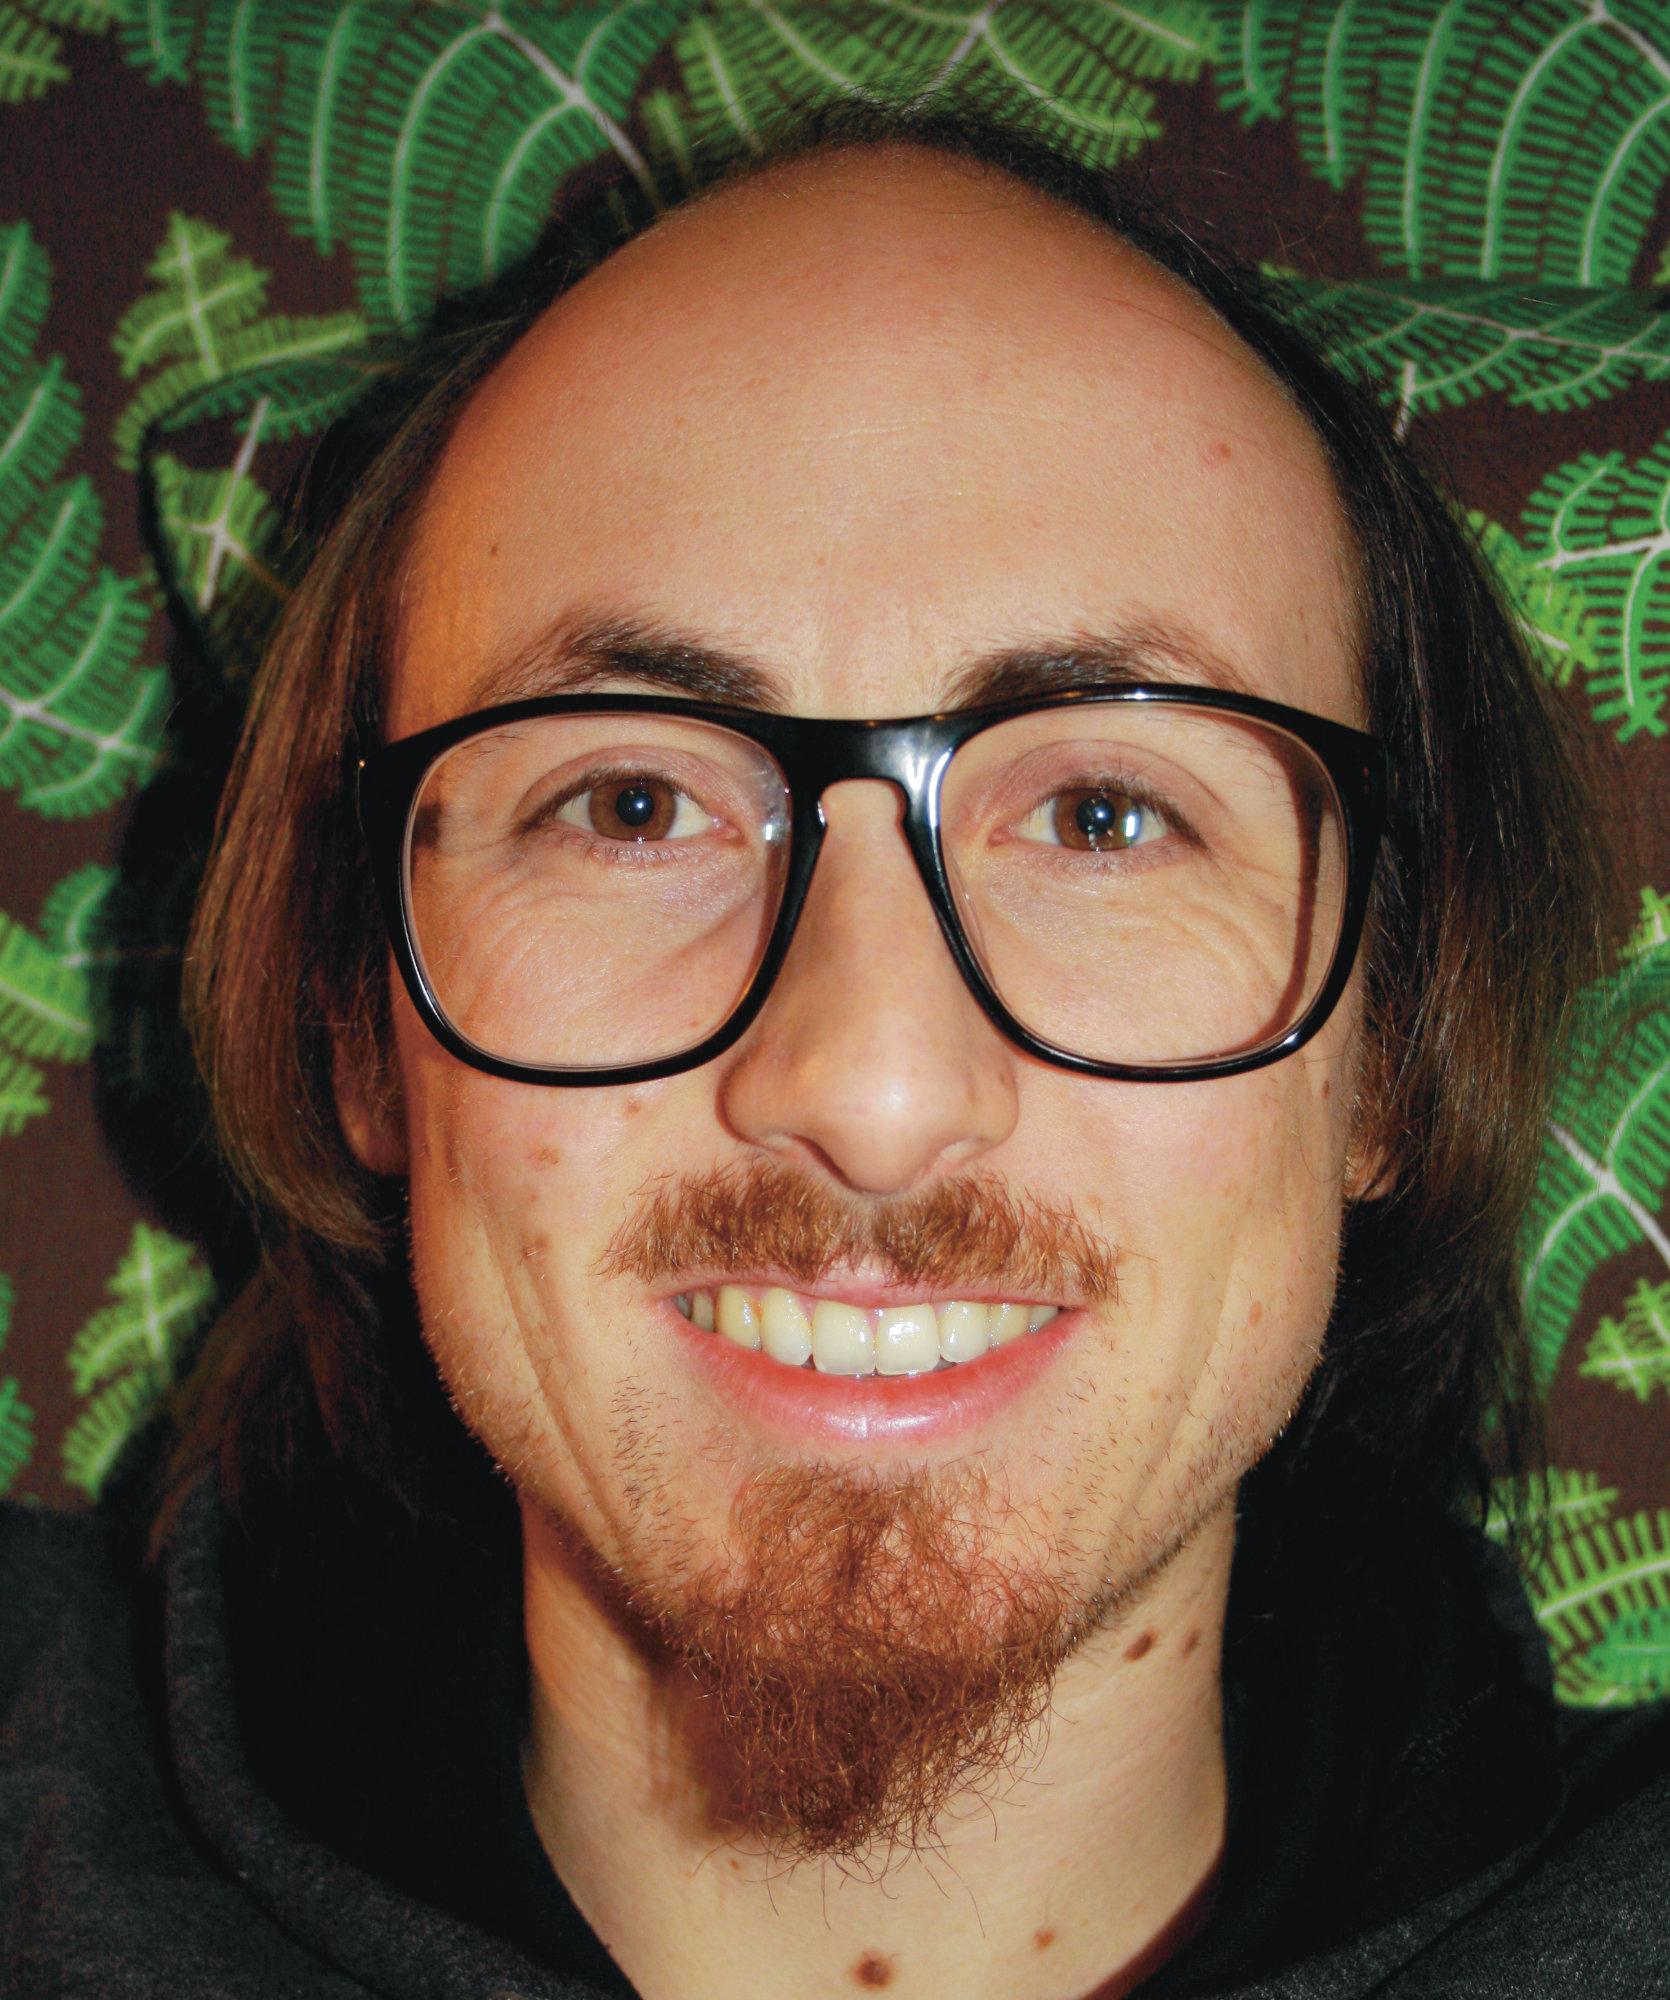 Michael Sillinger